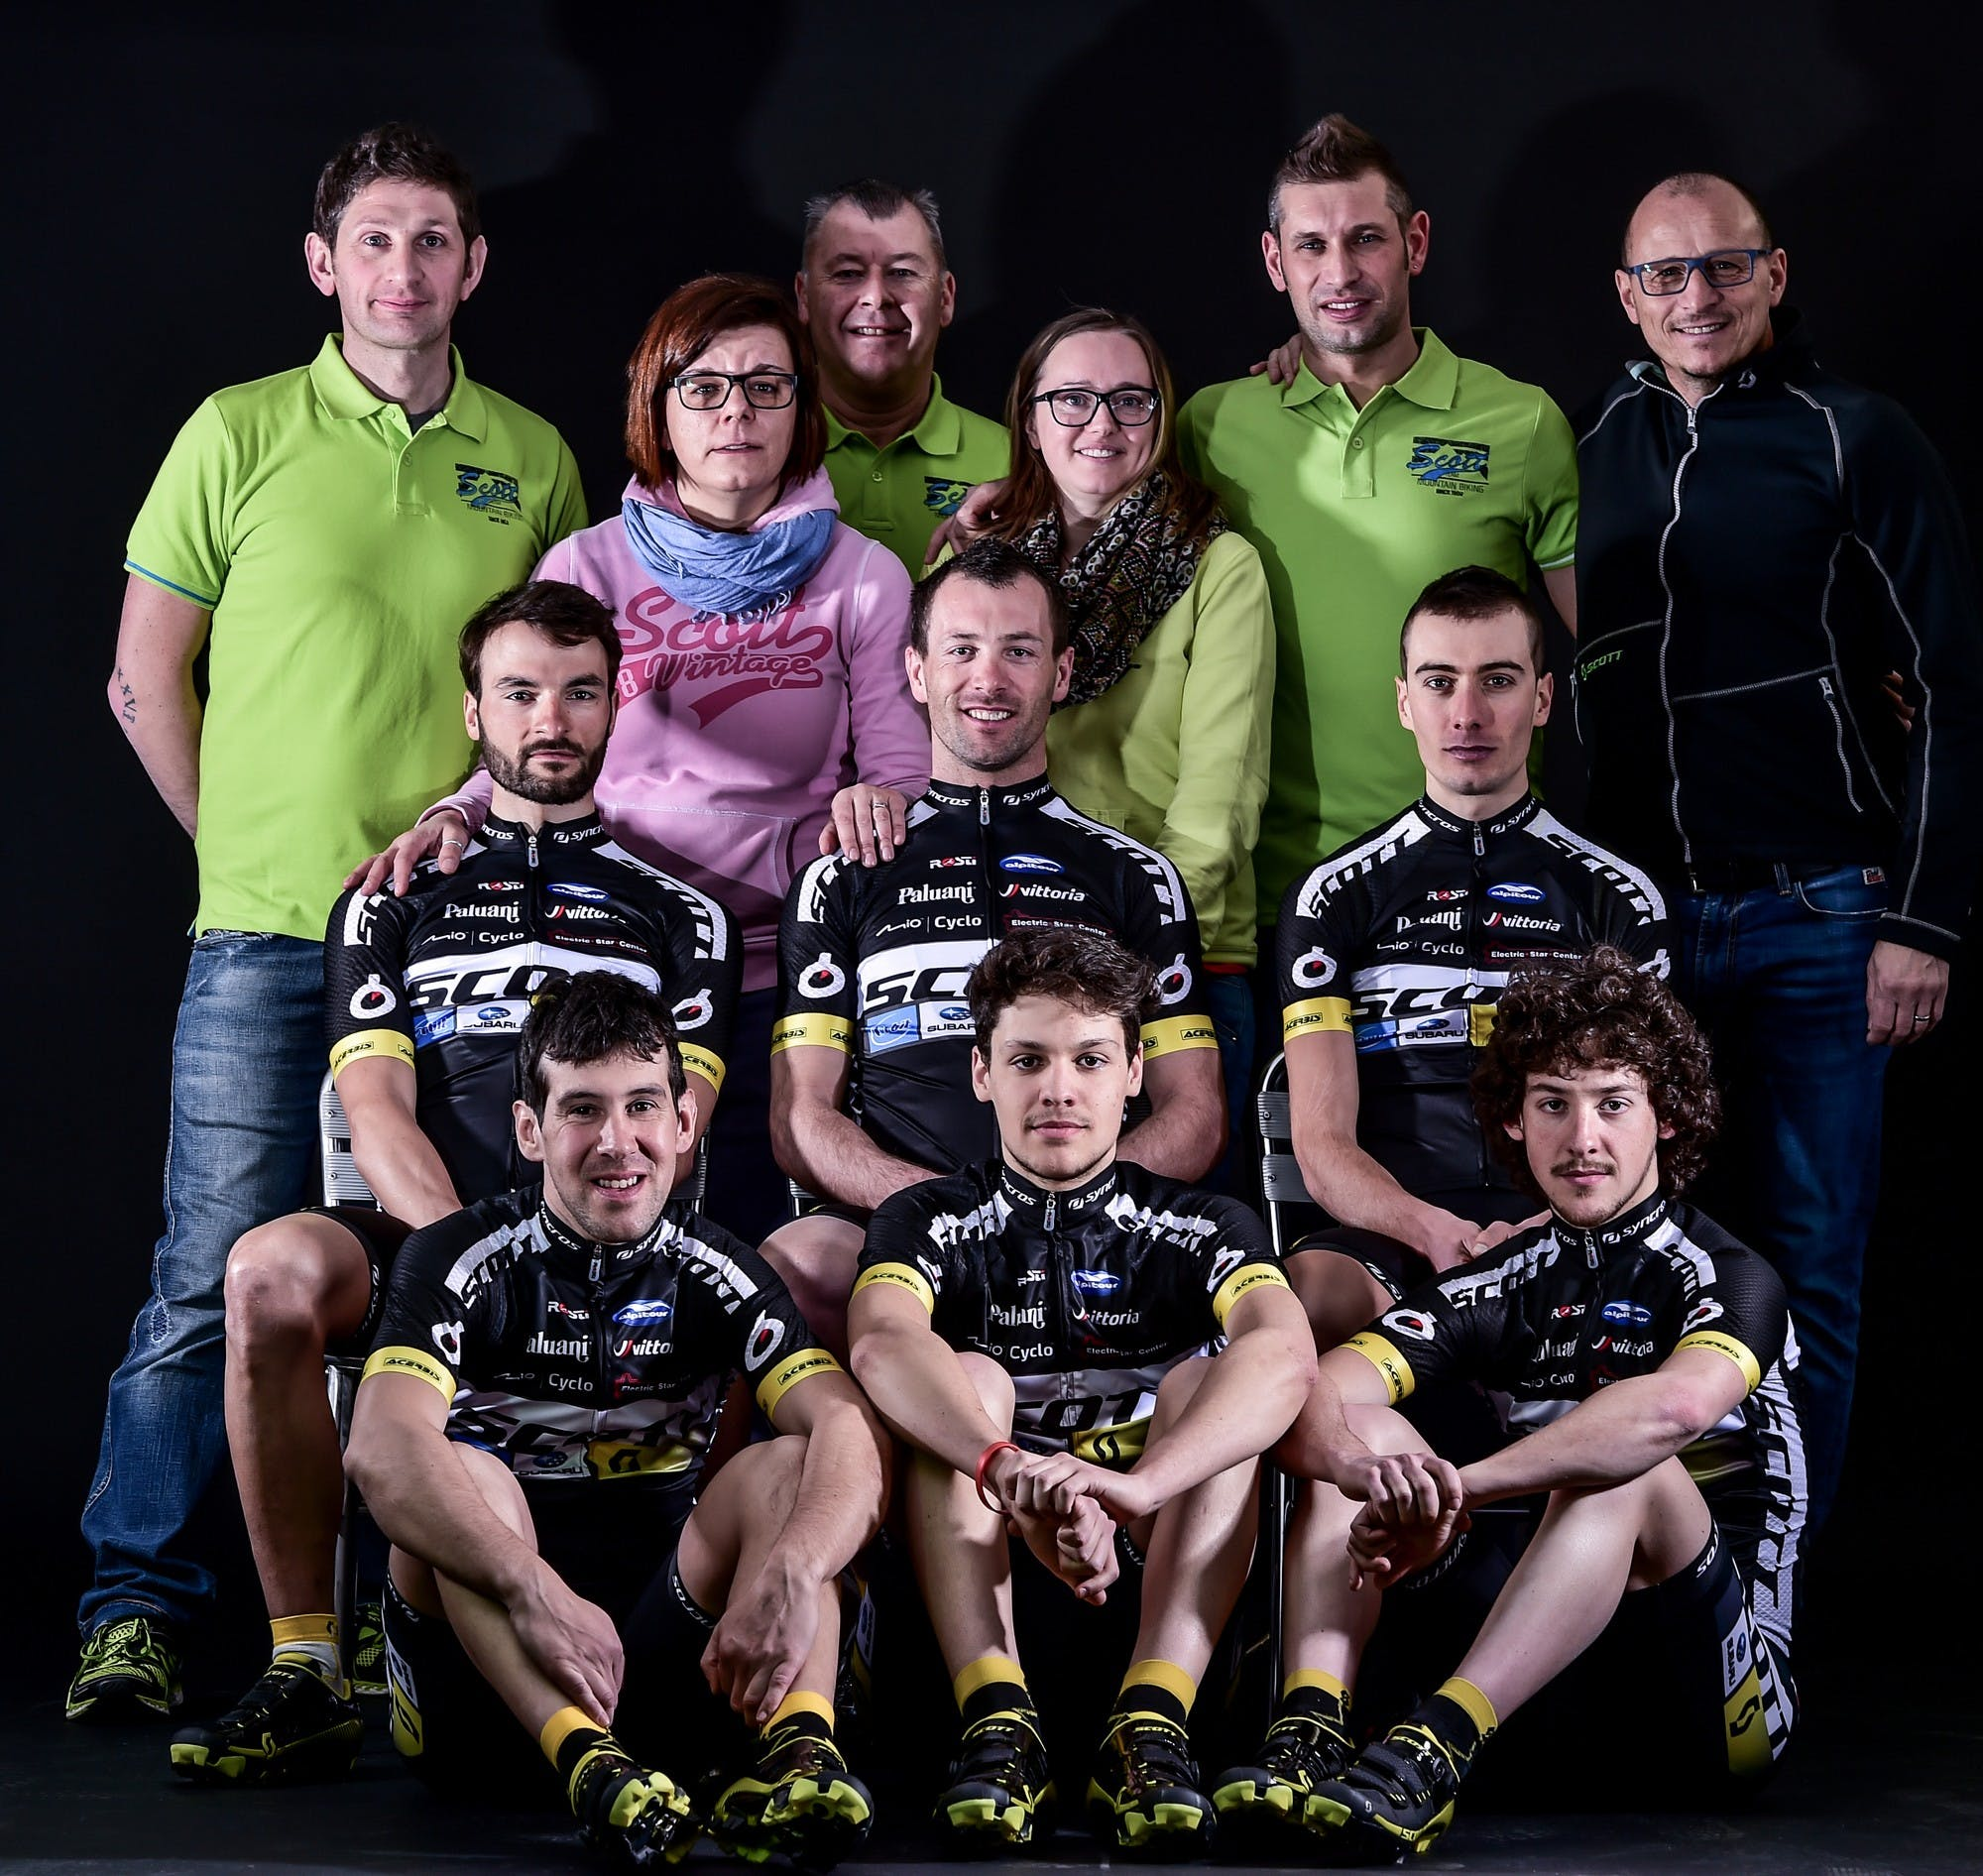 scott team2